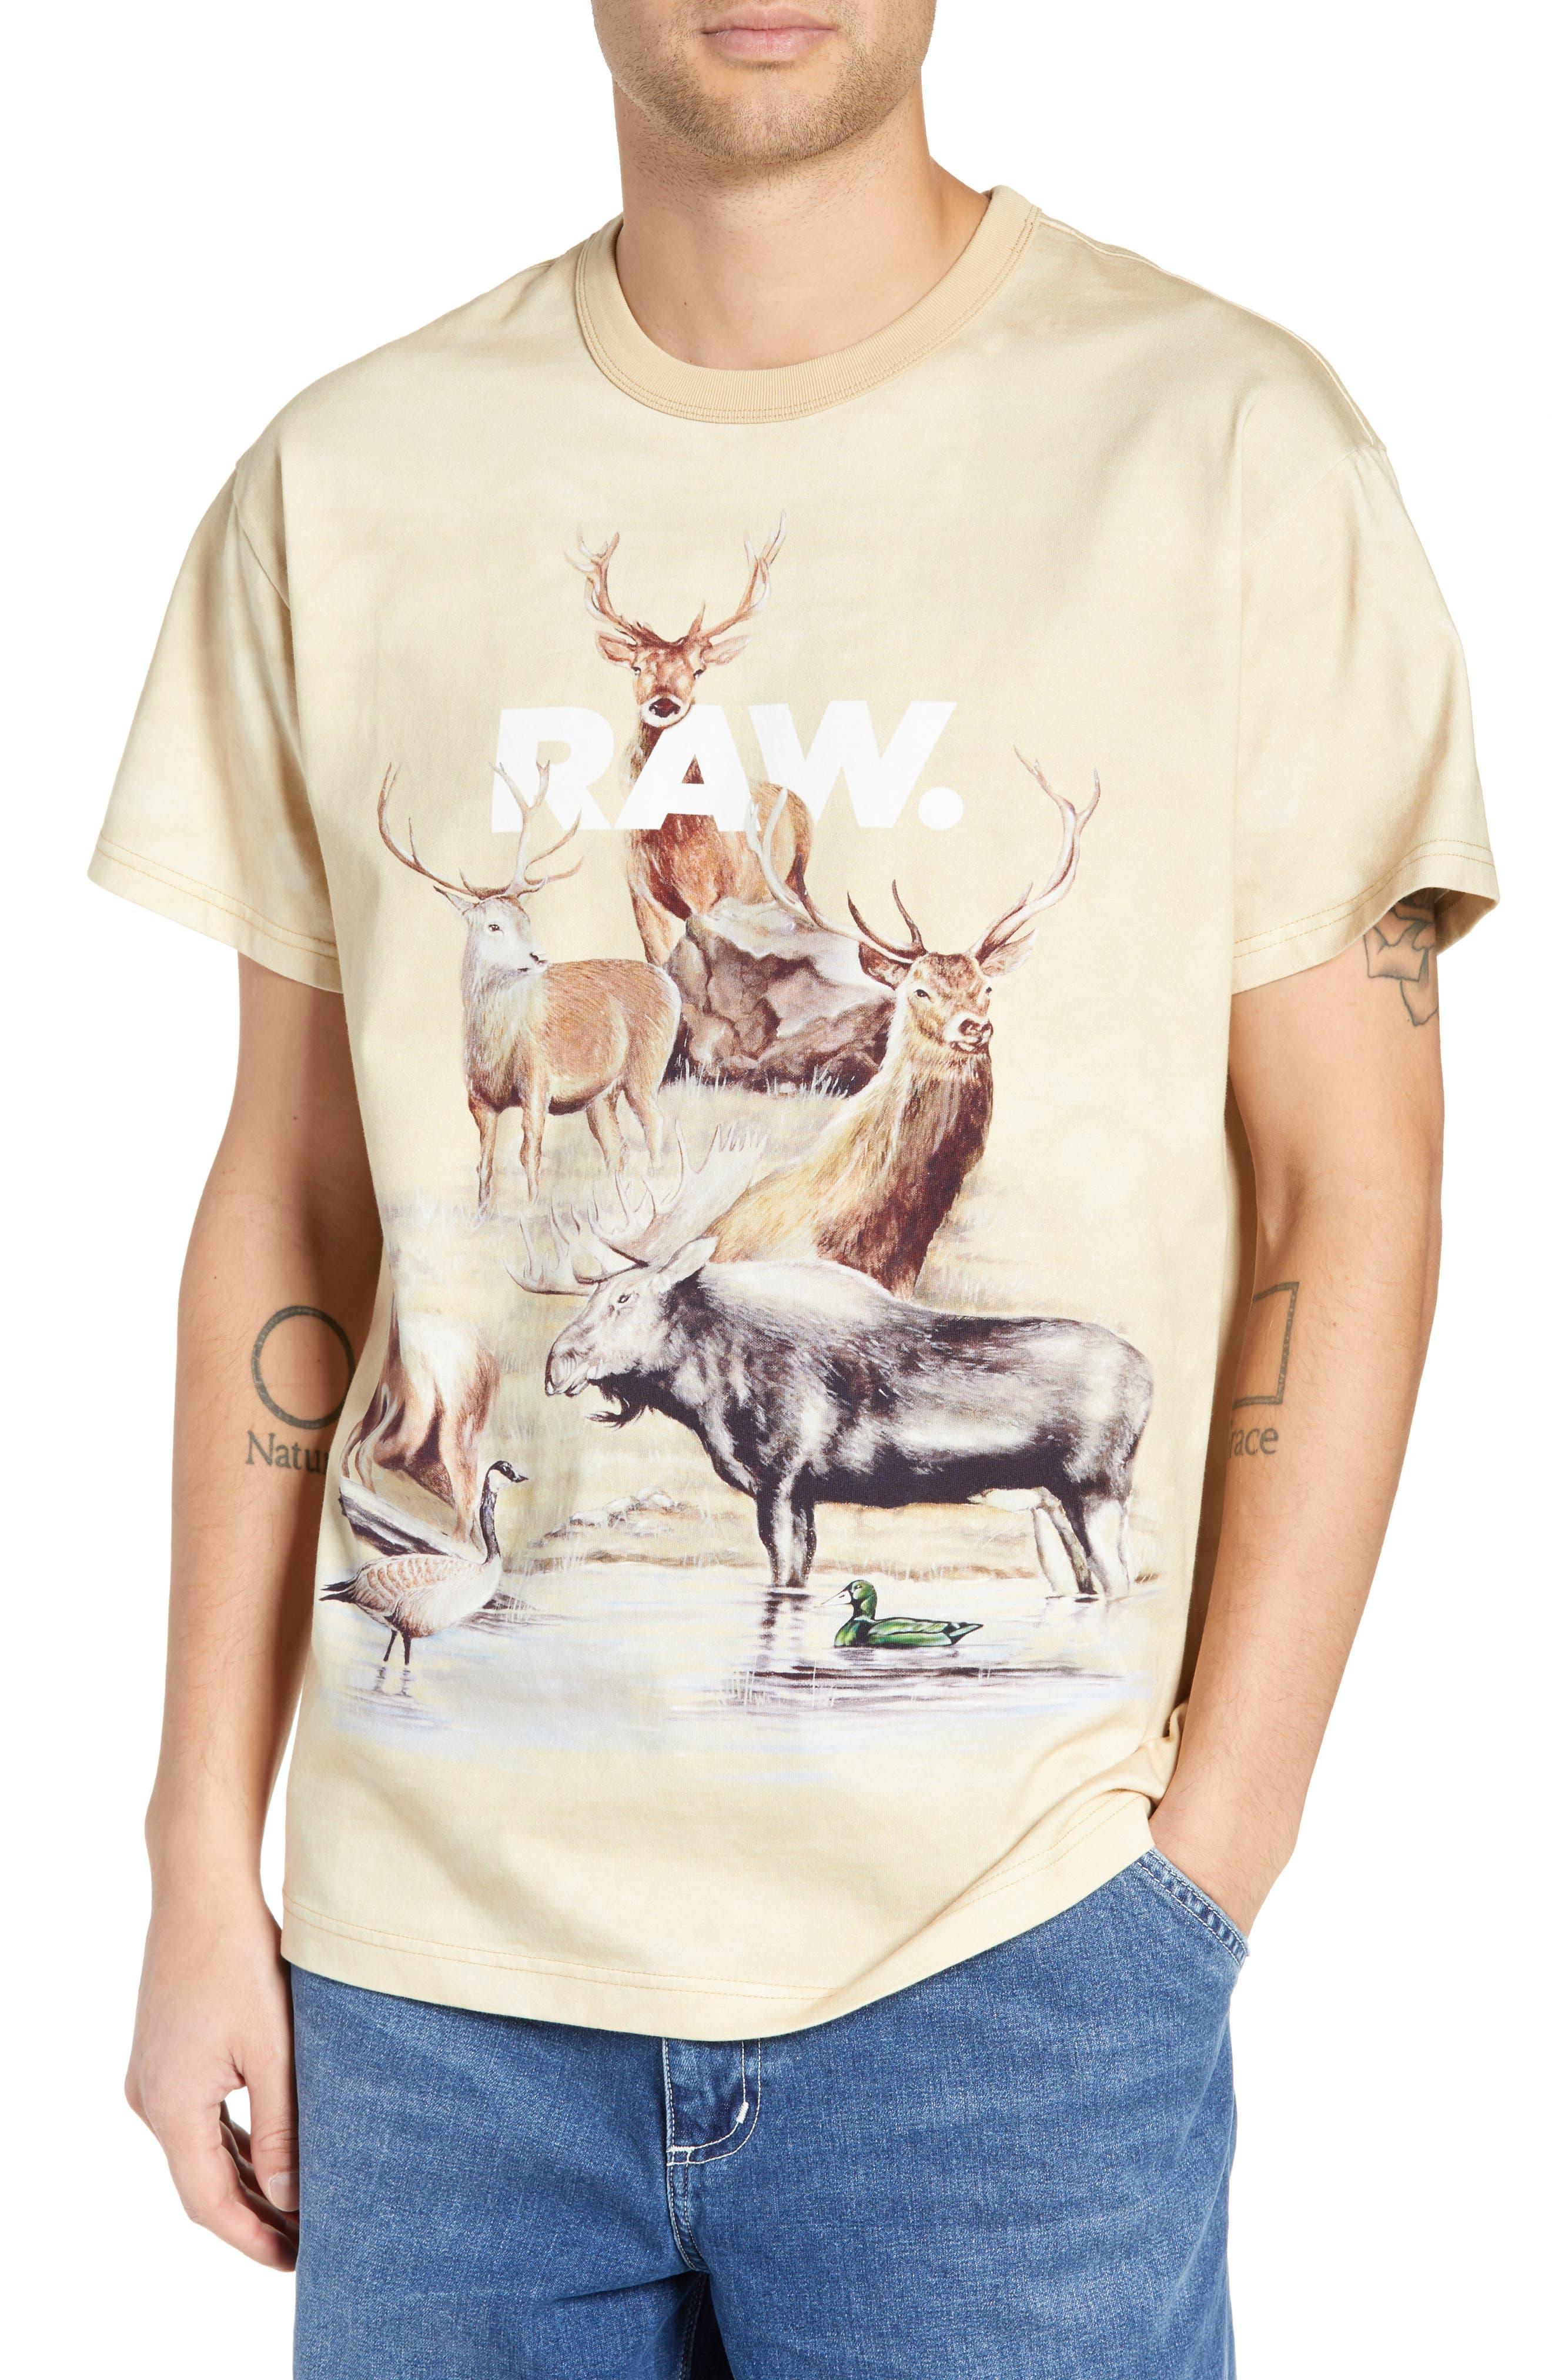 G-STAR RAW G-Star Cyrer Animal Loose T-Shirt in Sand